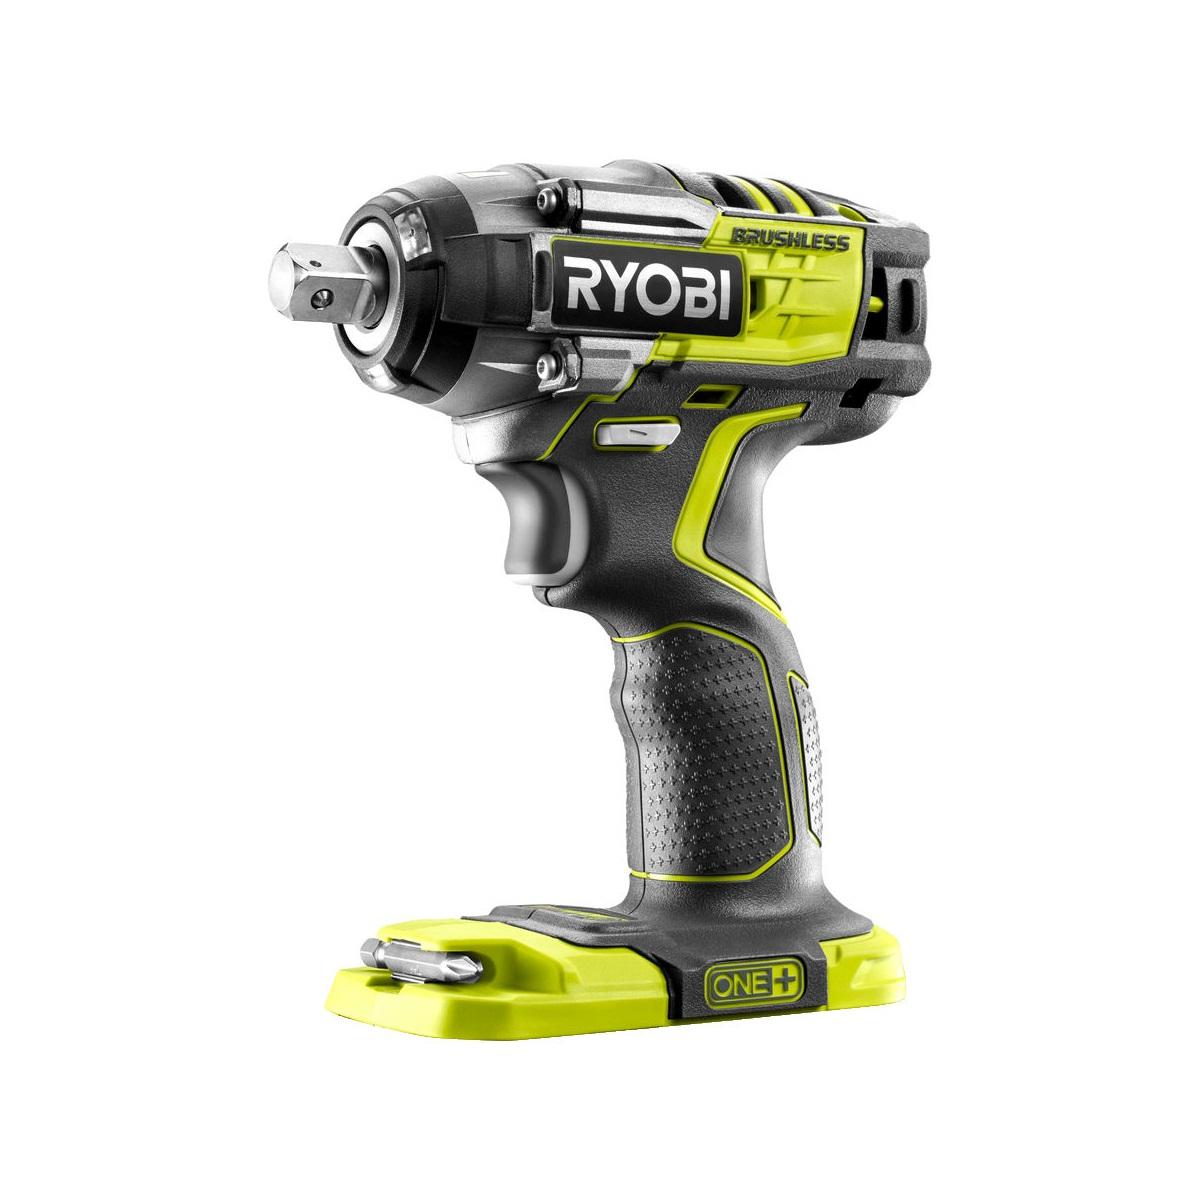 Ryobi R18IW7-0